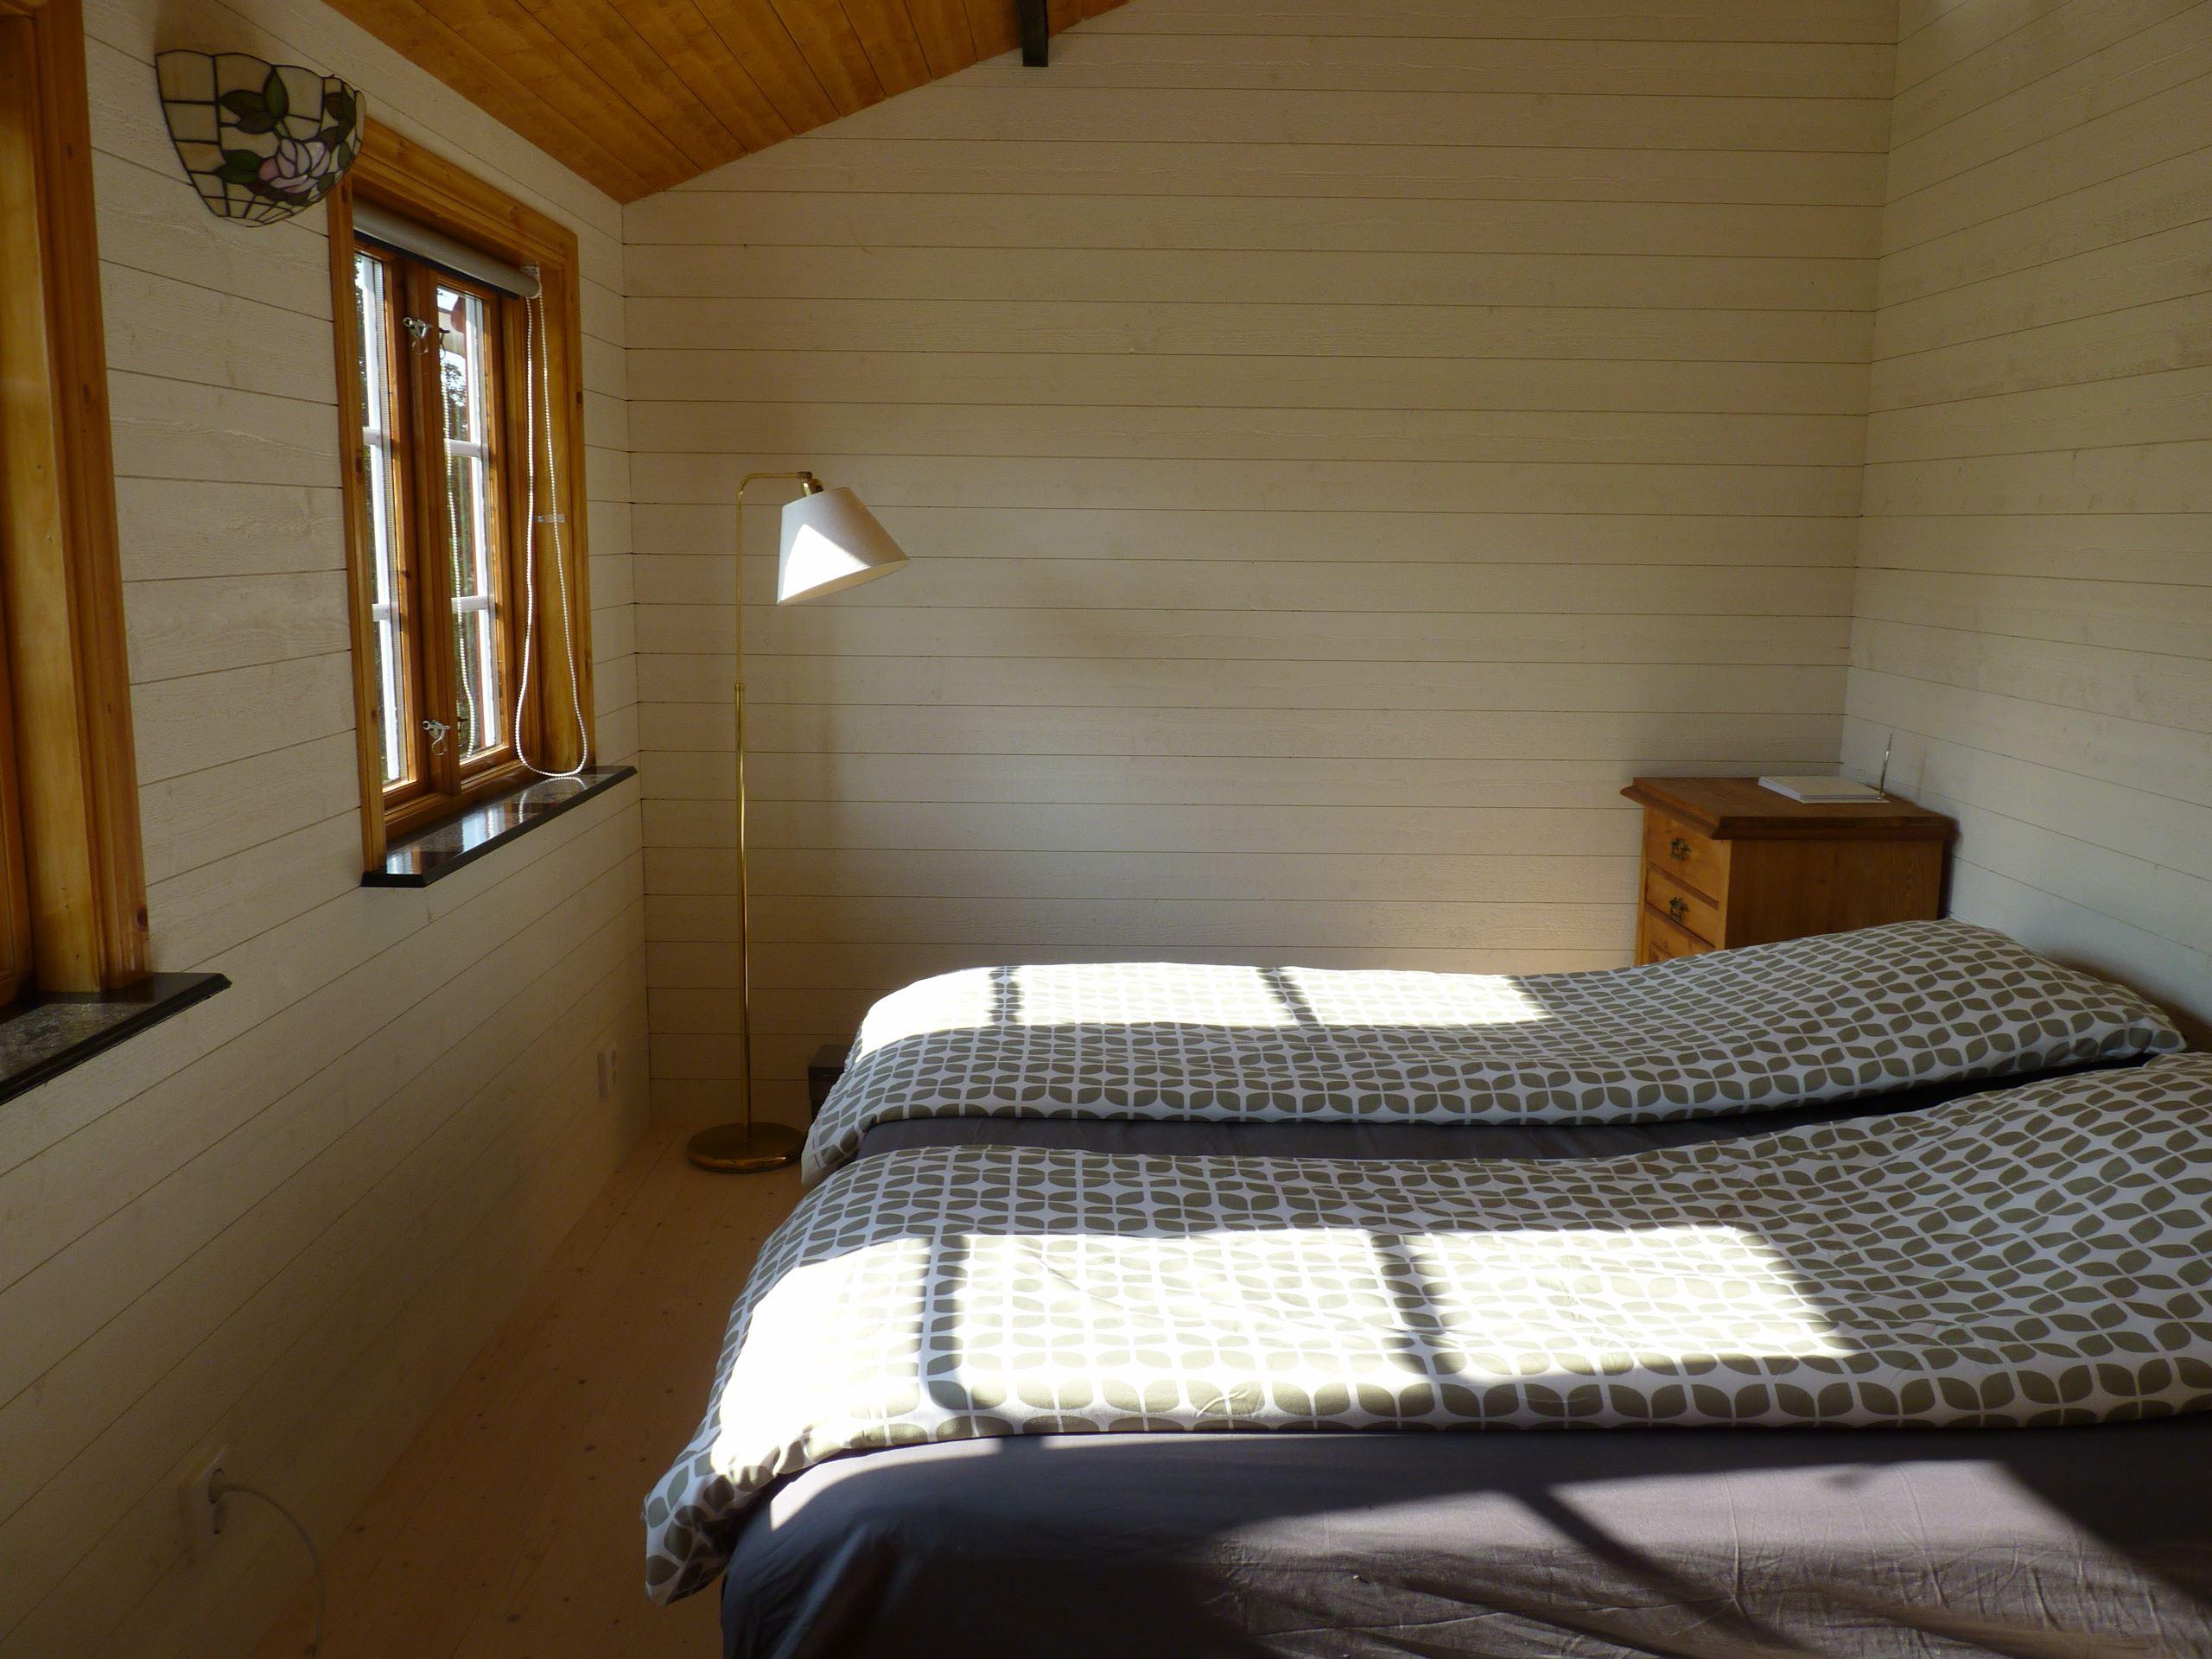 Ferienhaus mit 4 Betten - Torsö